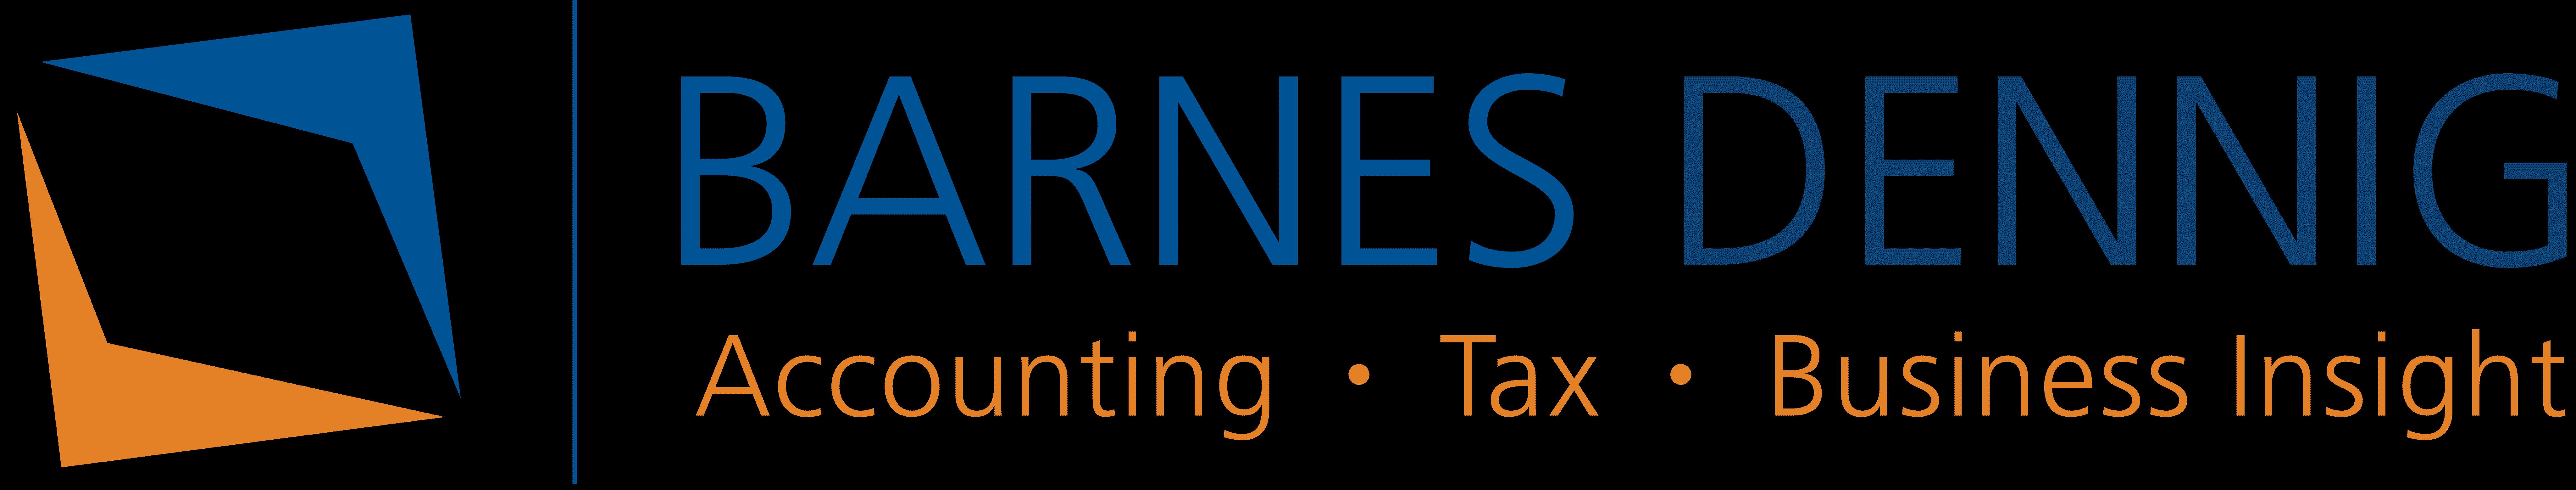 Barnes Dennig Company Logo